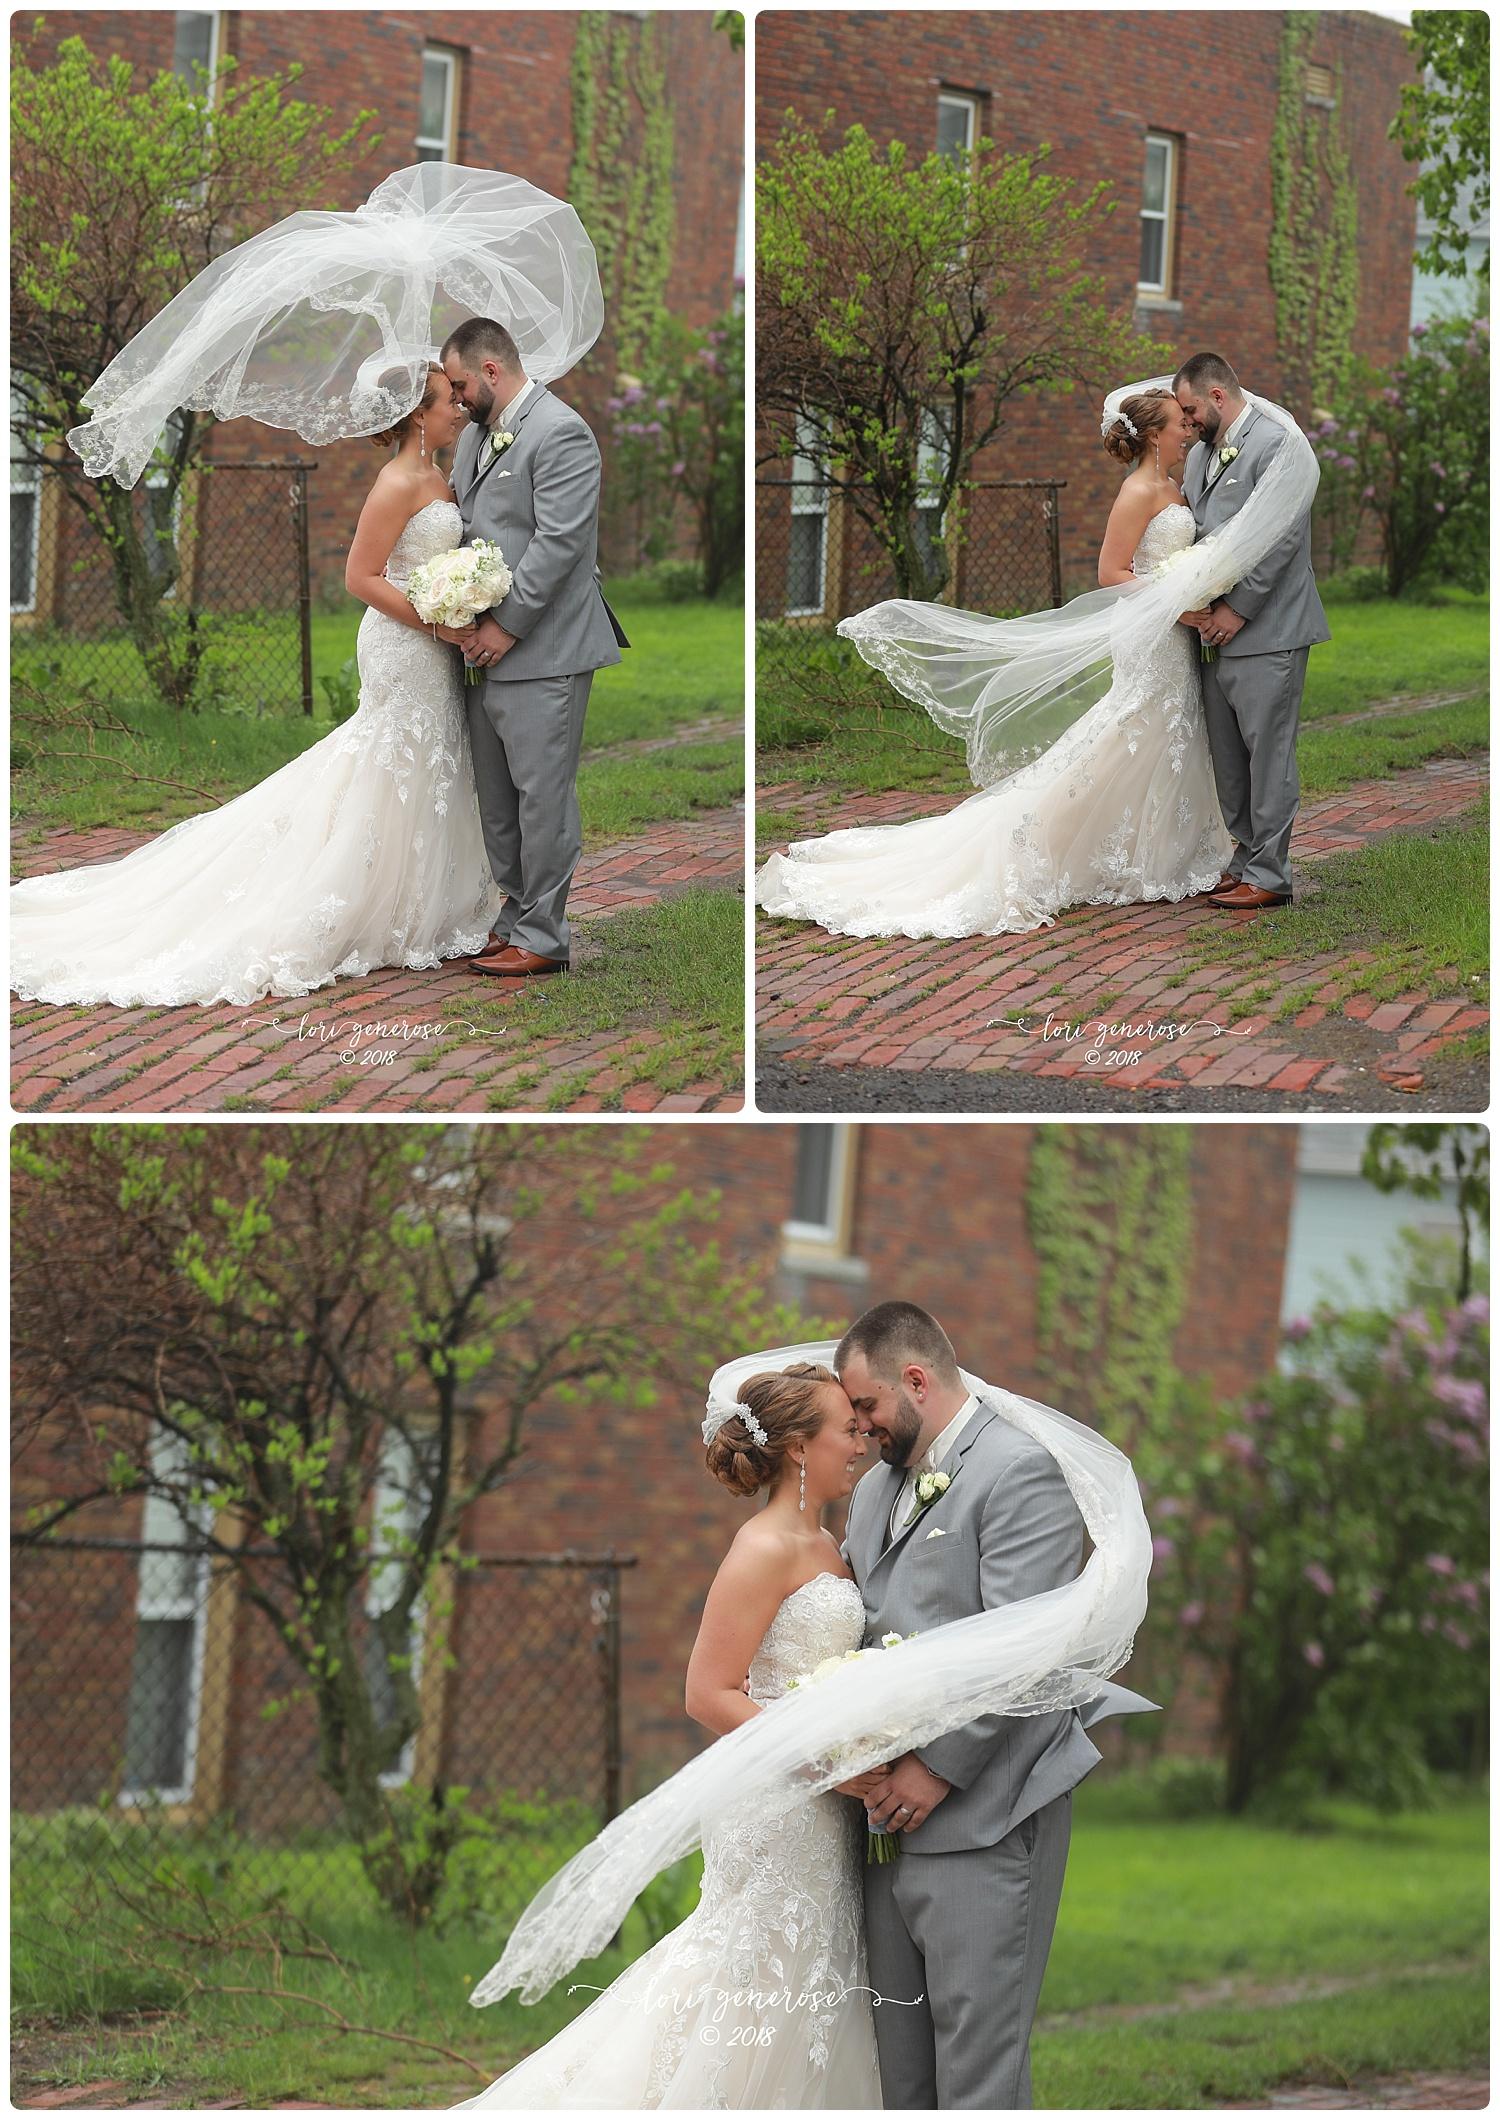 lgphotographylorigeneroseweddingbrideandgroomformalsveilweddingdress.jpg